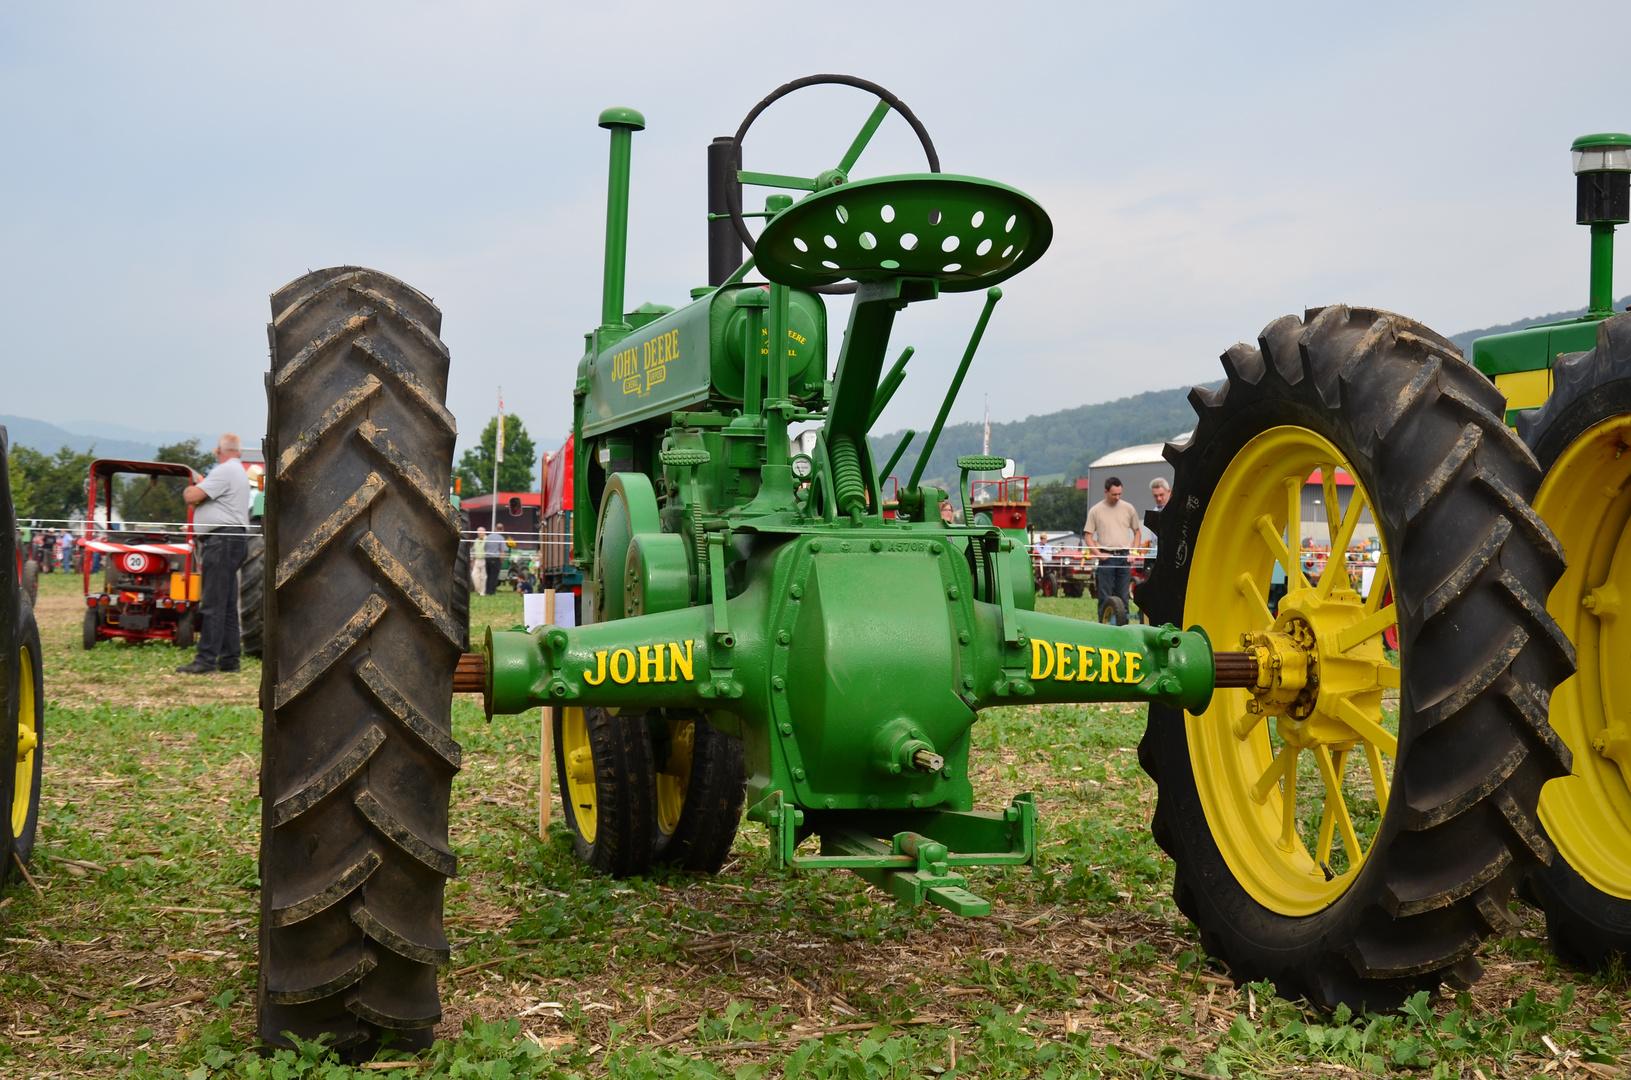 Der grüne Traktor